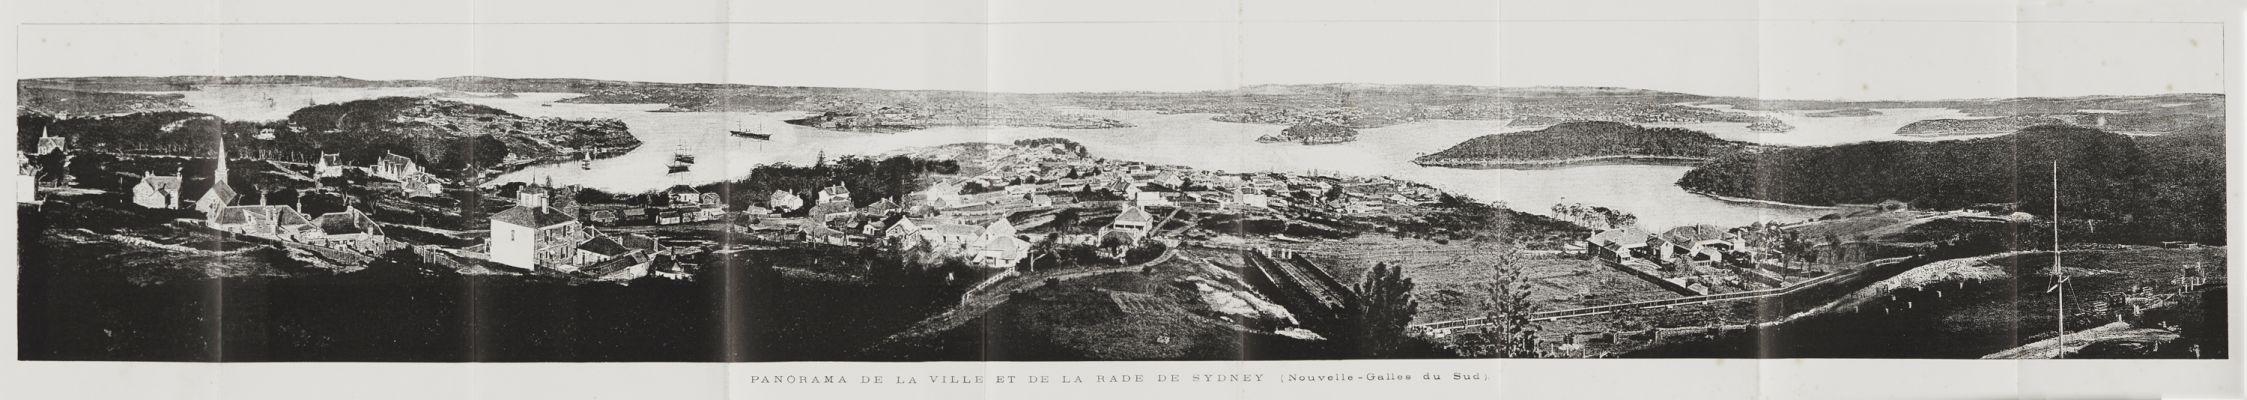 Panorama de la Ville et de la Rade de Sydney